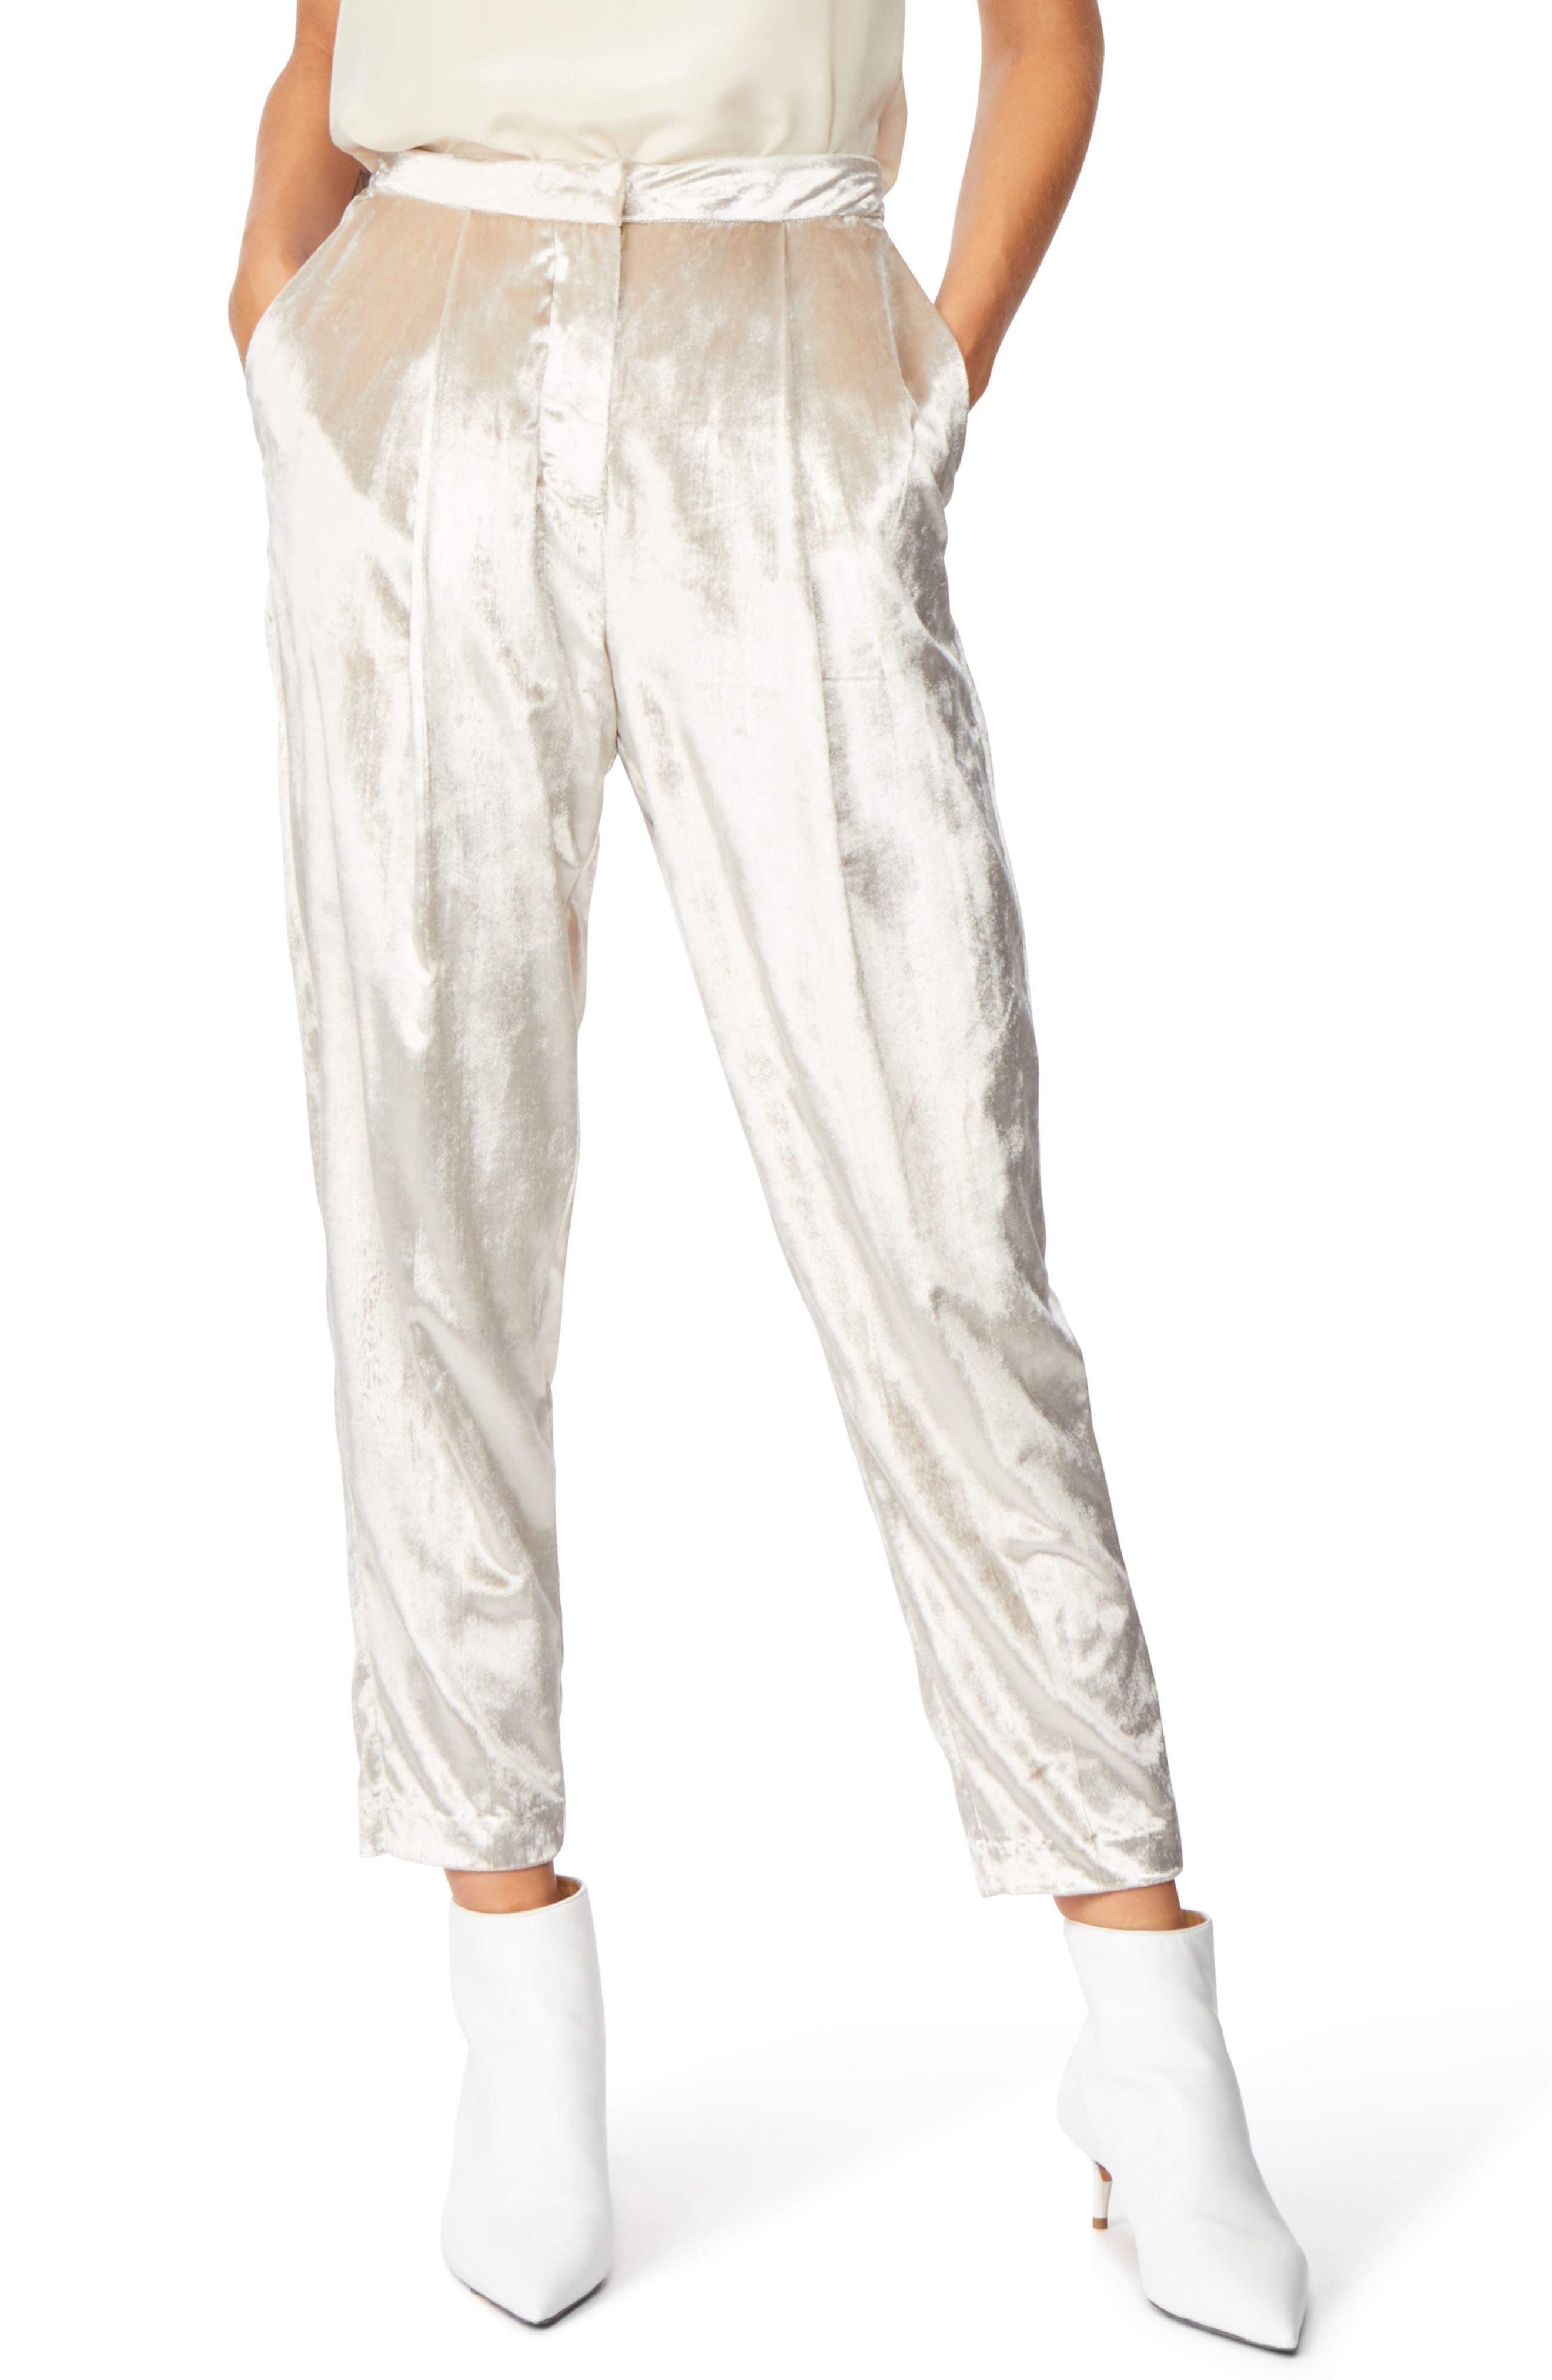 Velvet Trousers,                             Main thumbnail 1, color,                             CHAMPAGNE